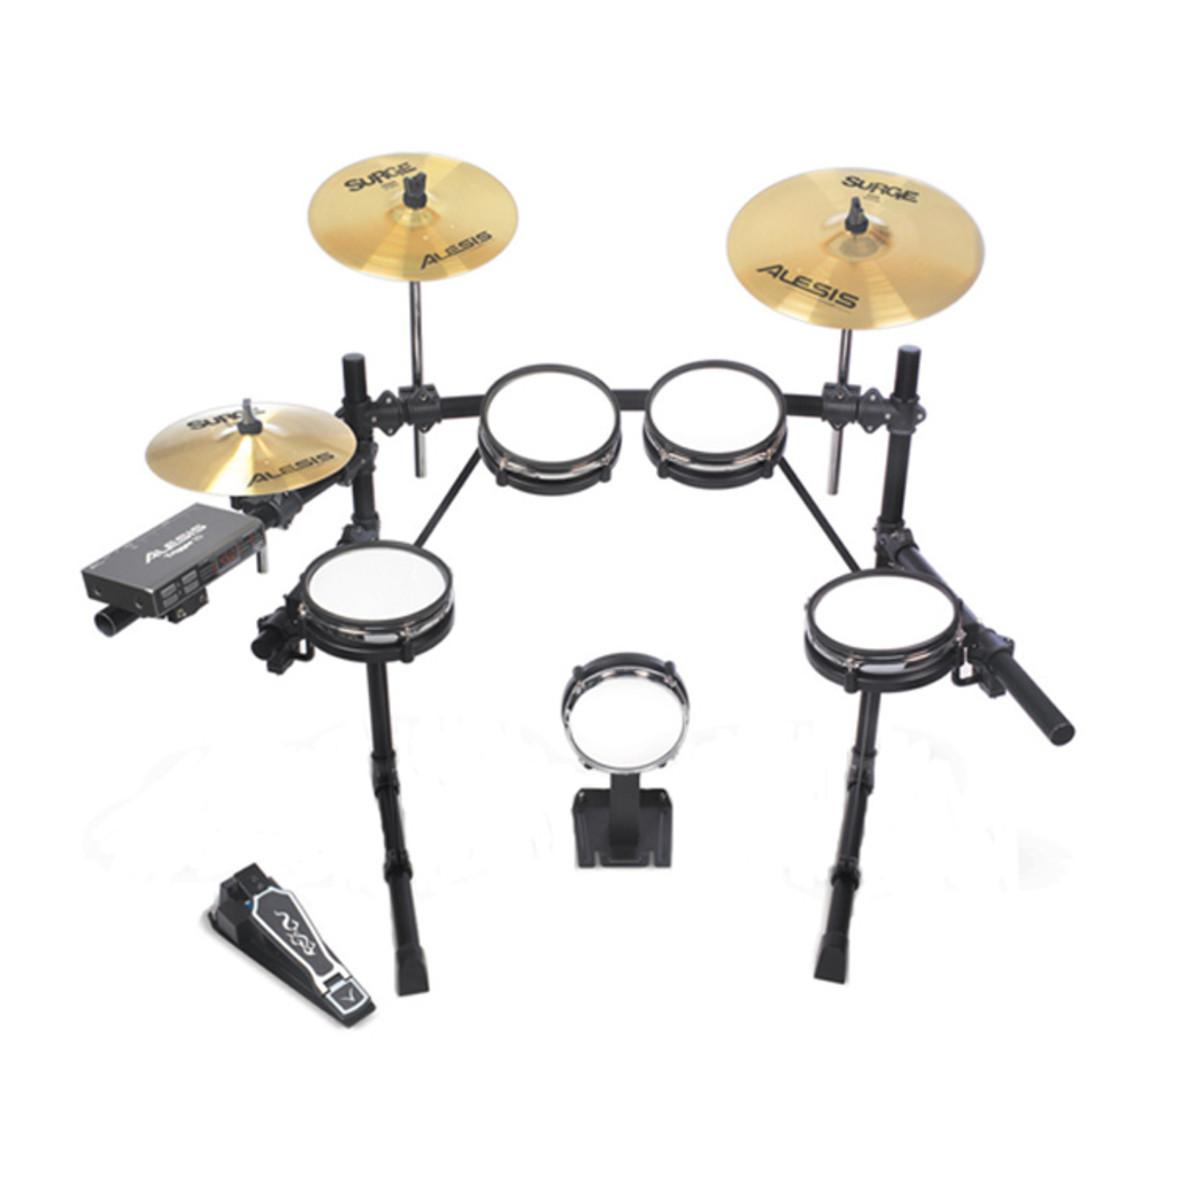 alesis dm5 usb pro drum kit surge cymbals at. Black Bedroom Furniture Sets. Home Design Ideas